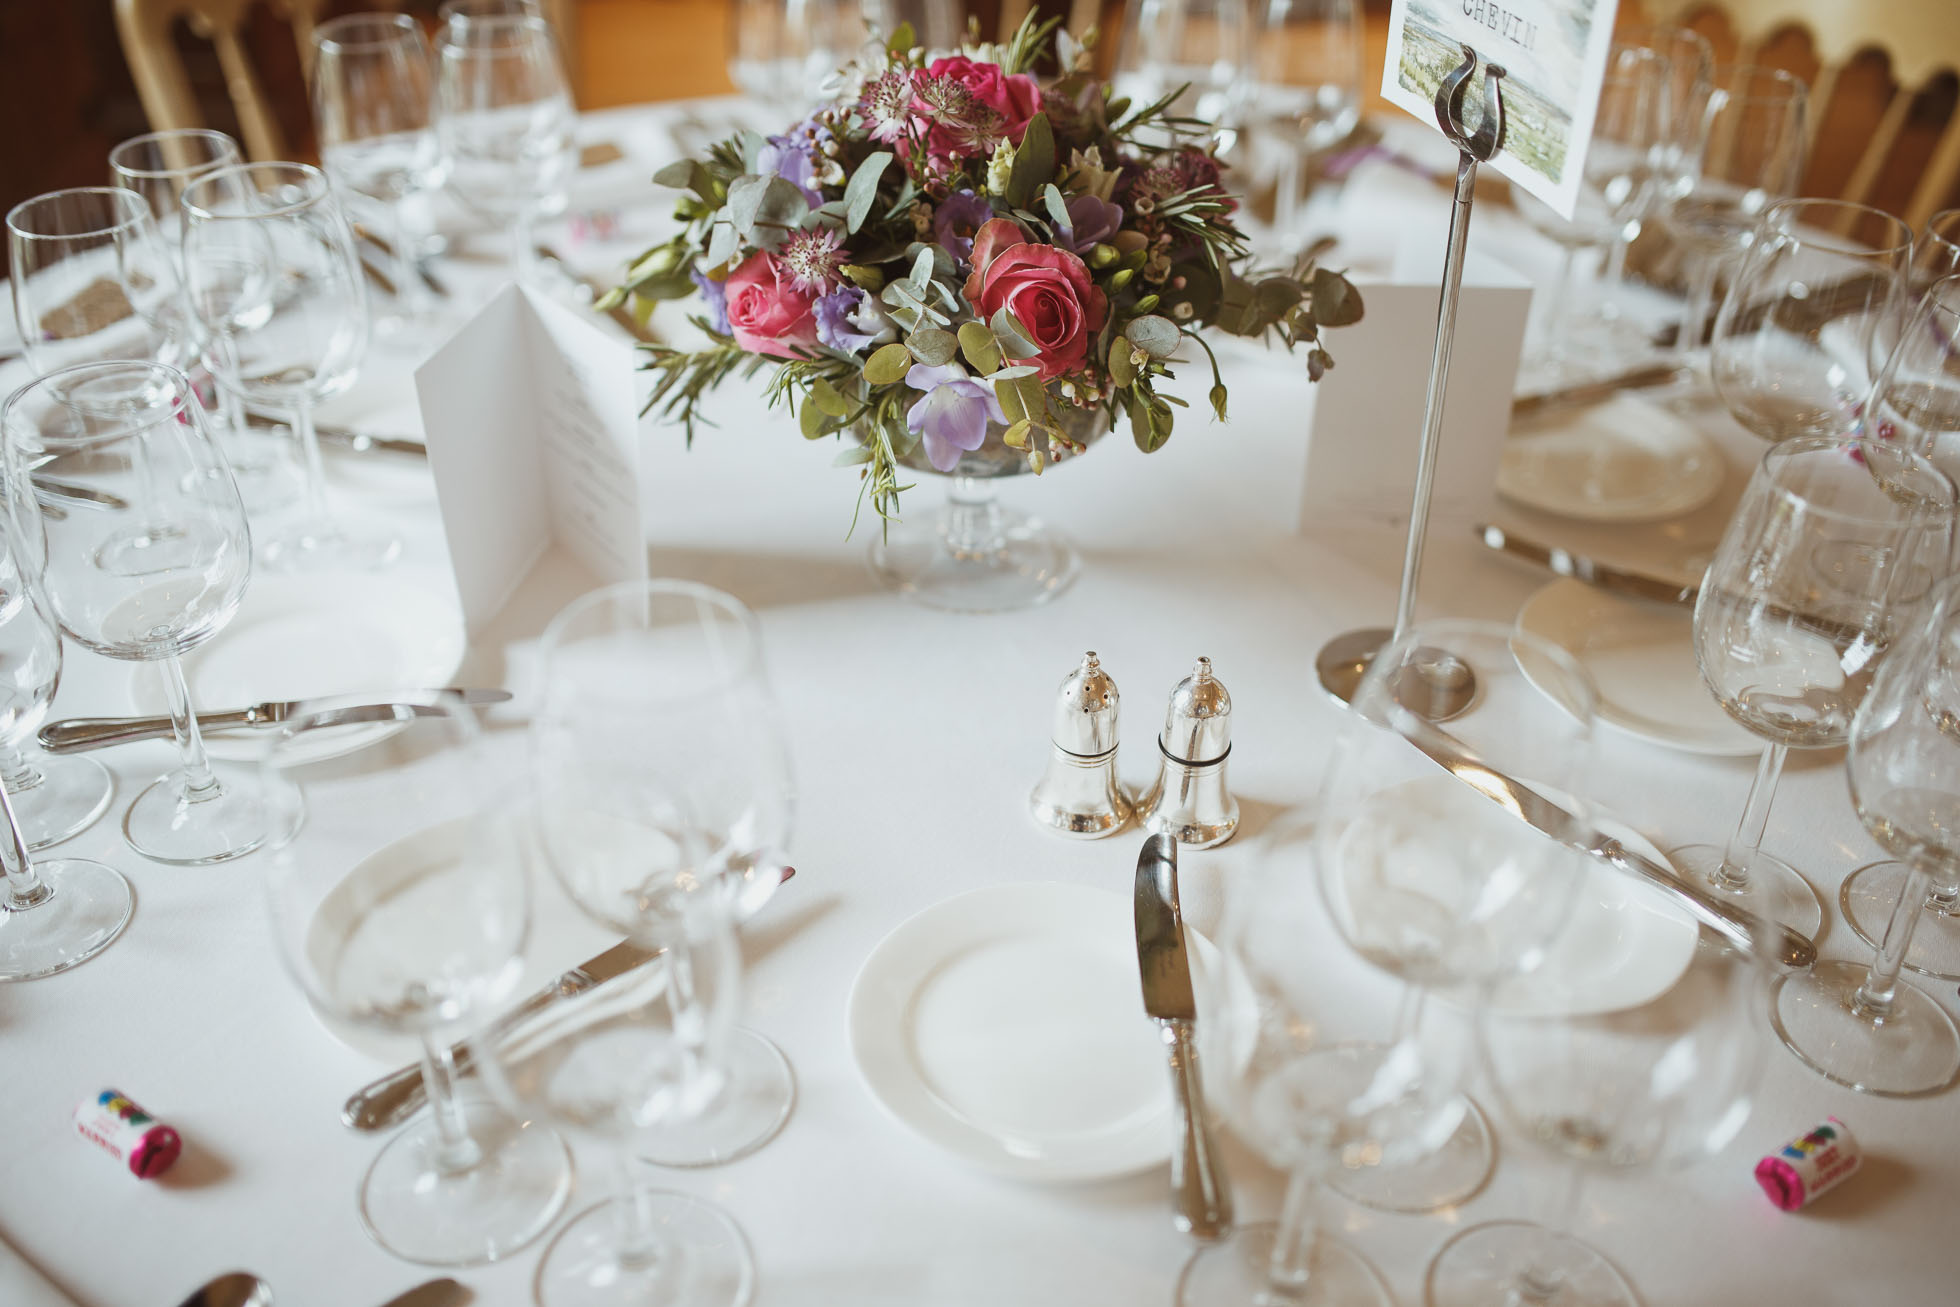 denton-hall-wedding-photographer-13.jpg